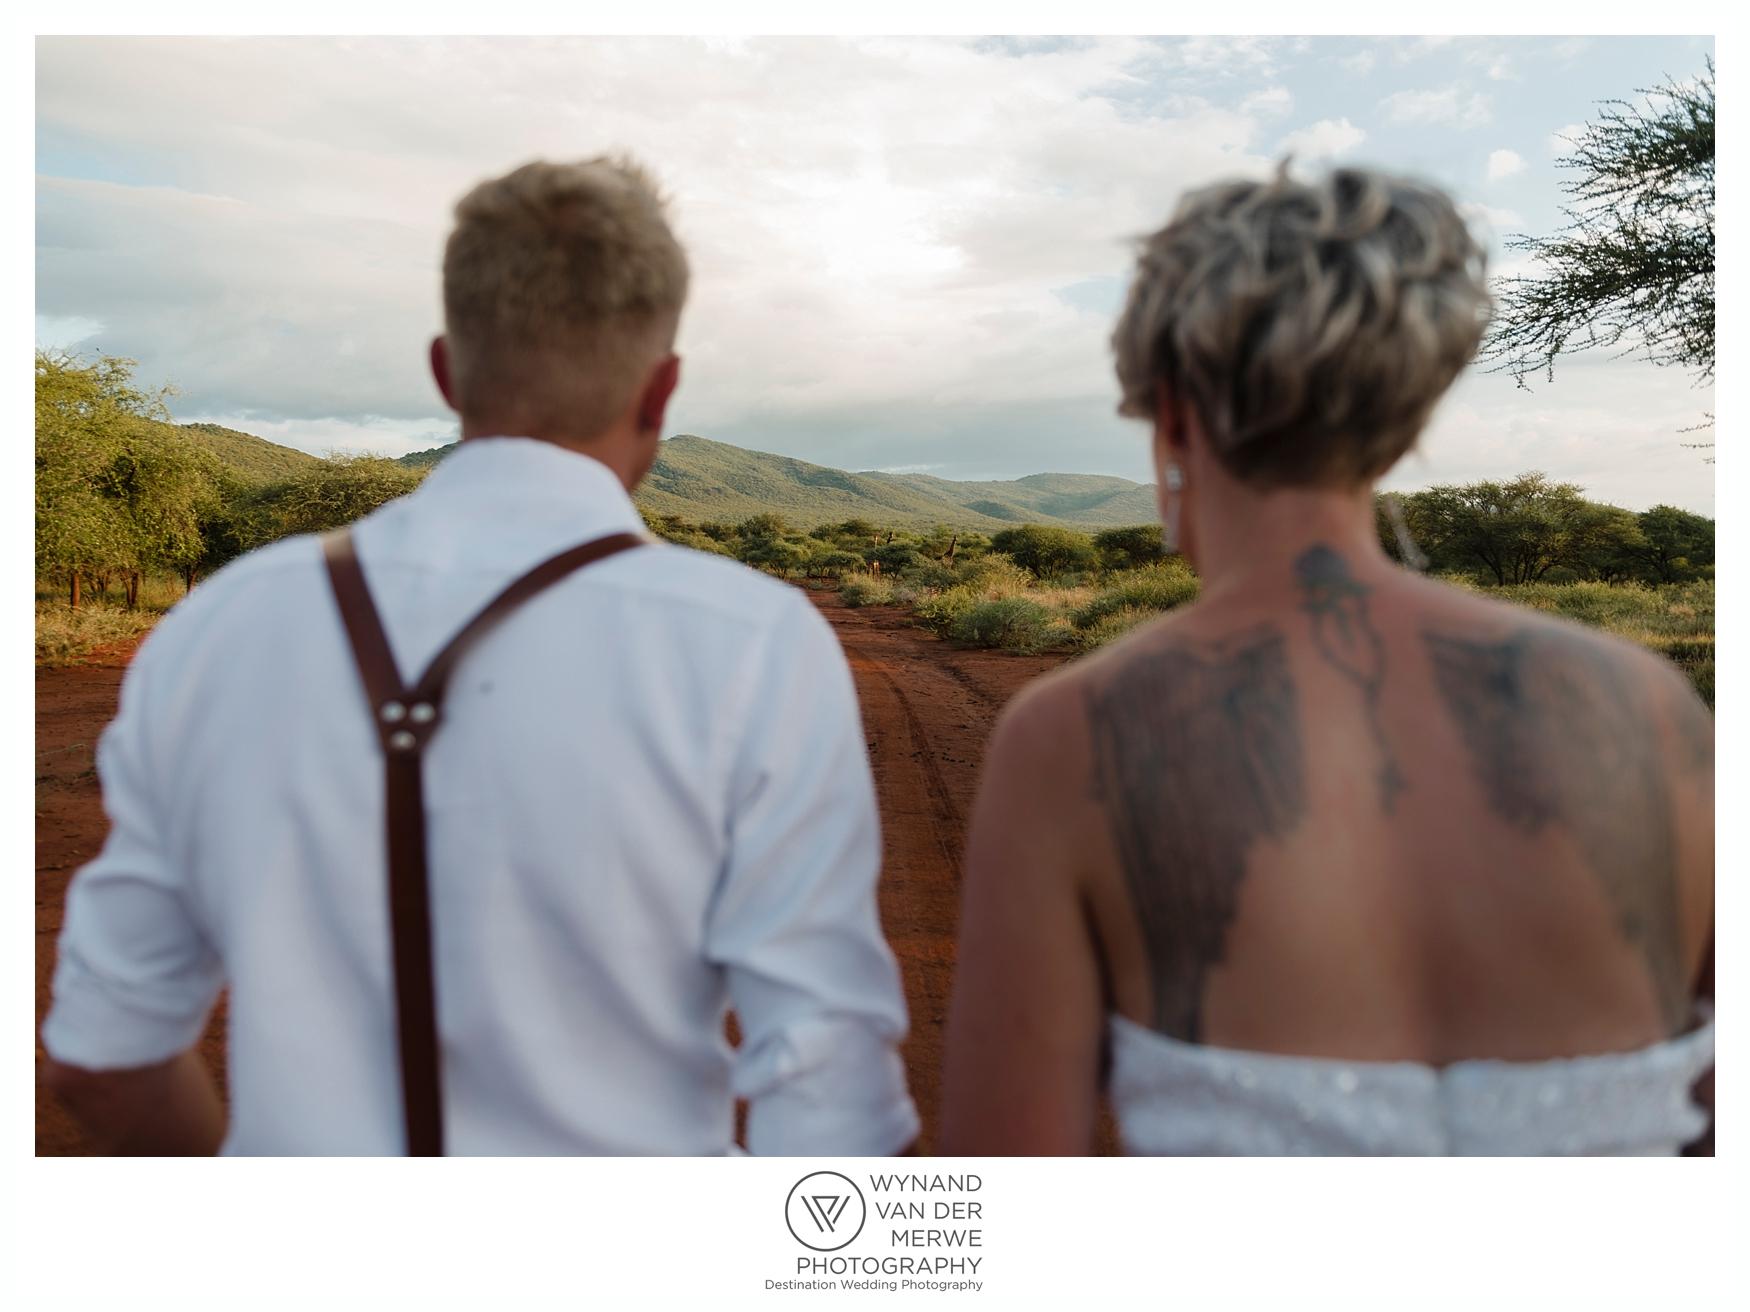 WynandvanderMerwe_weddingphotography_bushveldwedding_northam_bushveld_limpopowedding_limpopo_southafrica-261.jpg